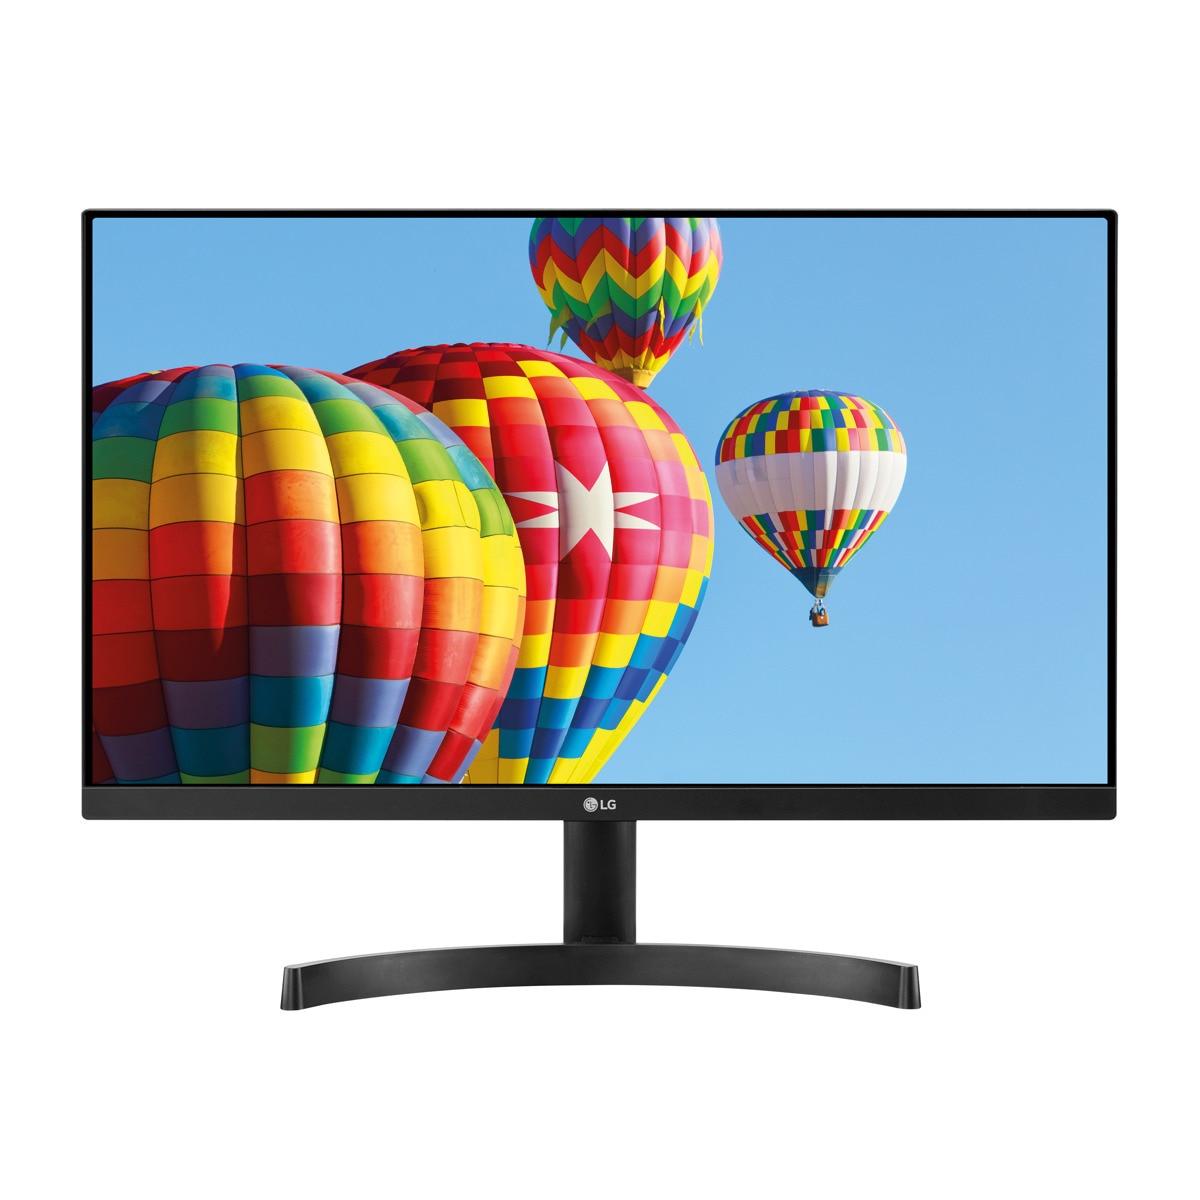 "Écran PC 24"" LG MK-600MB - Full HD, Dalle IPS, 75 Hz, AMD FreeSync, Noir"